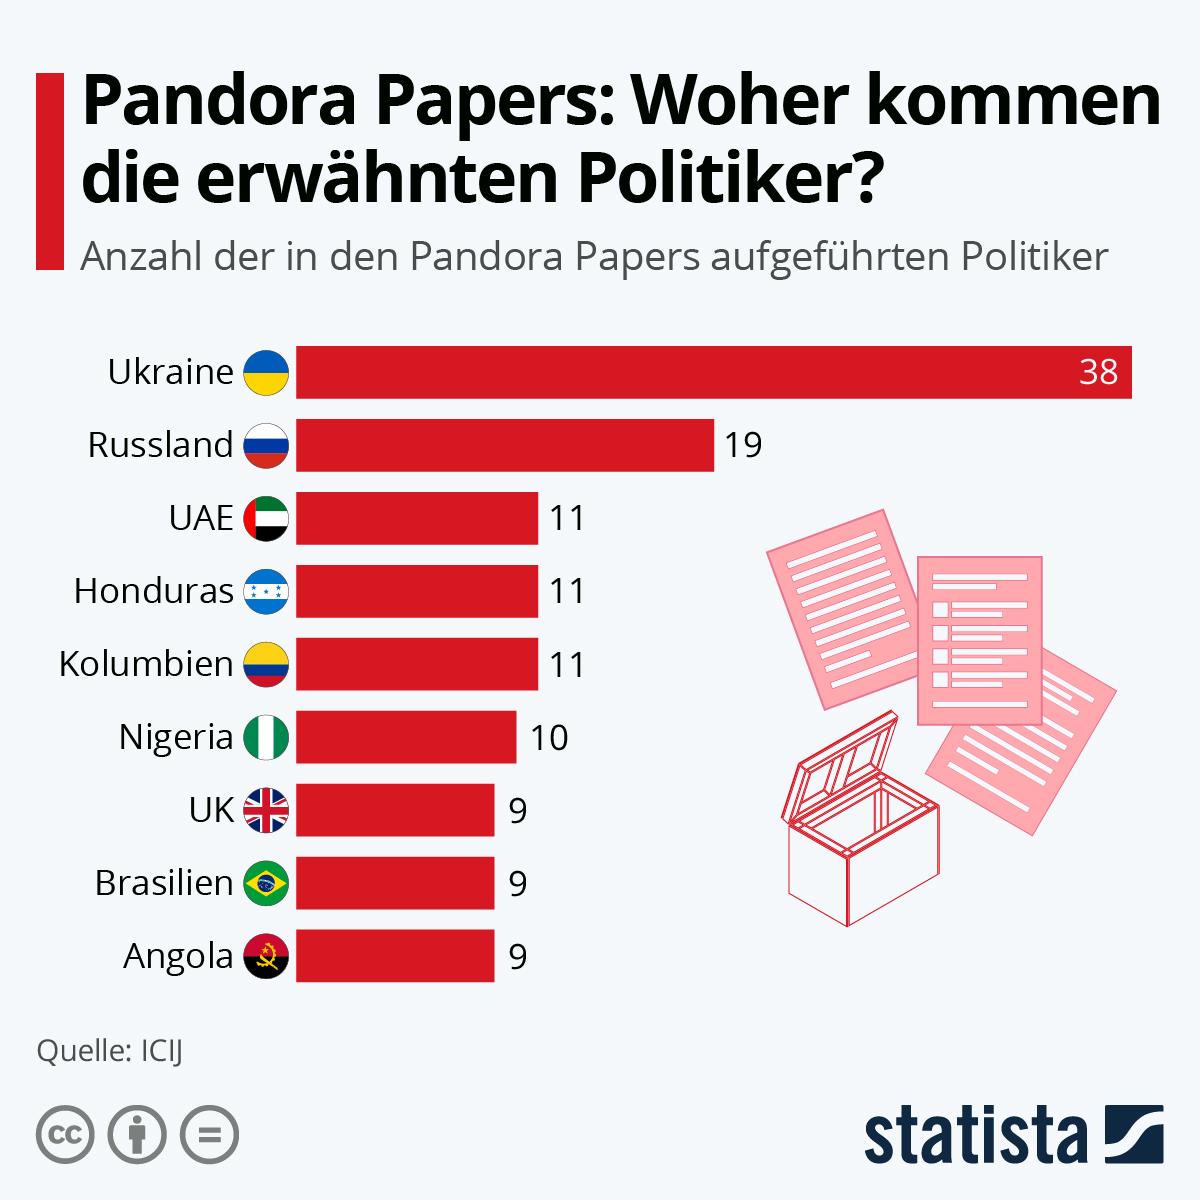 Infografik: Pandora Papers: Woher kommen die erwähnten Politiker? | Statista